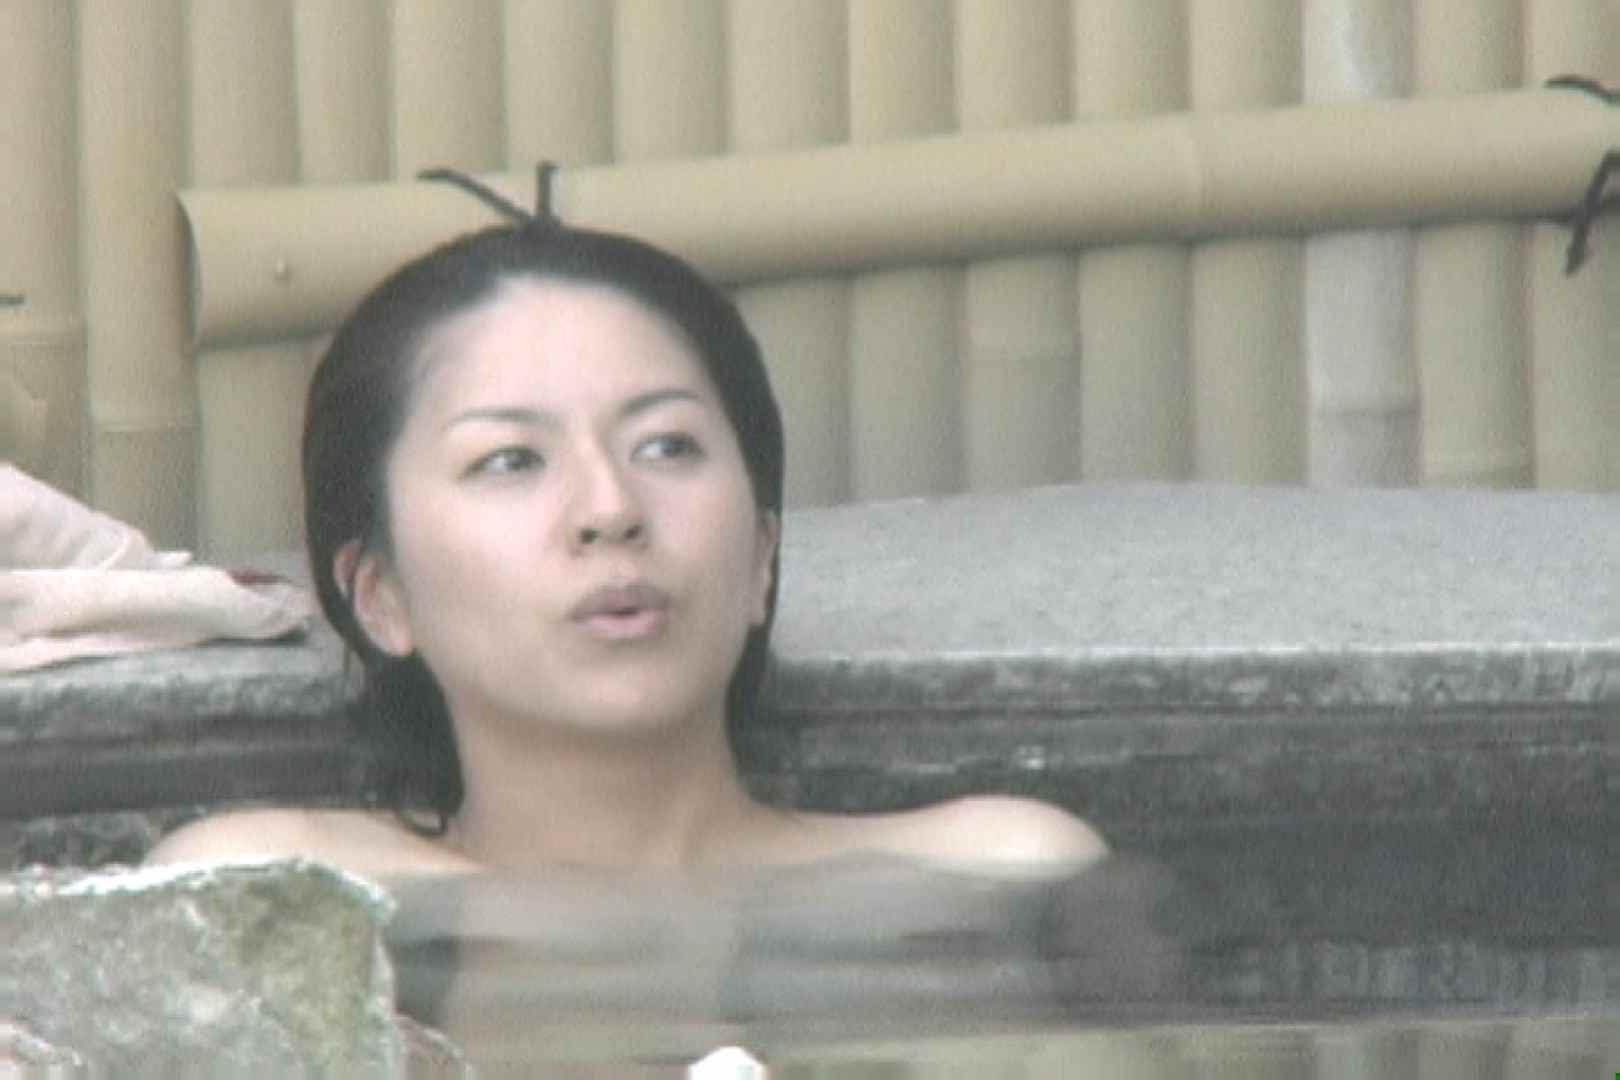 Aquaな露天風呂Vol.694 露天 | OLセックス  67画像 22